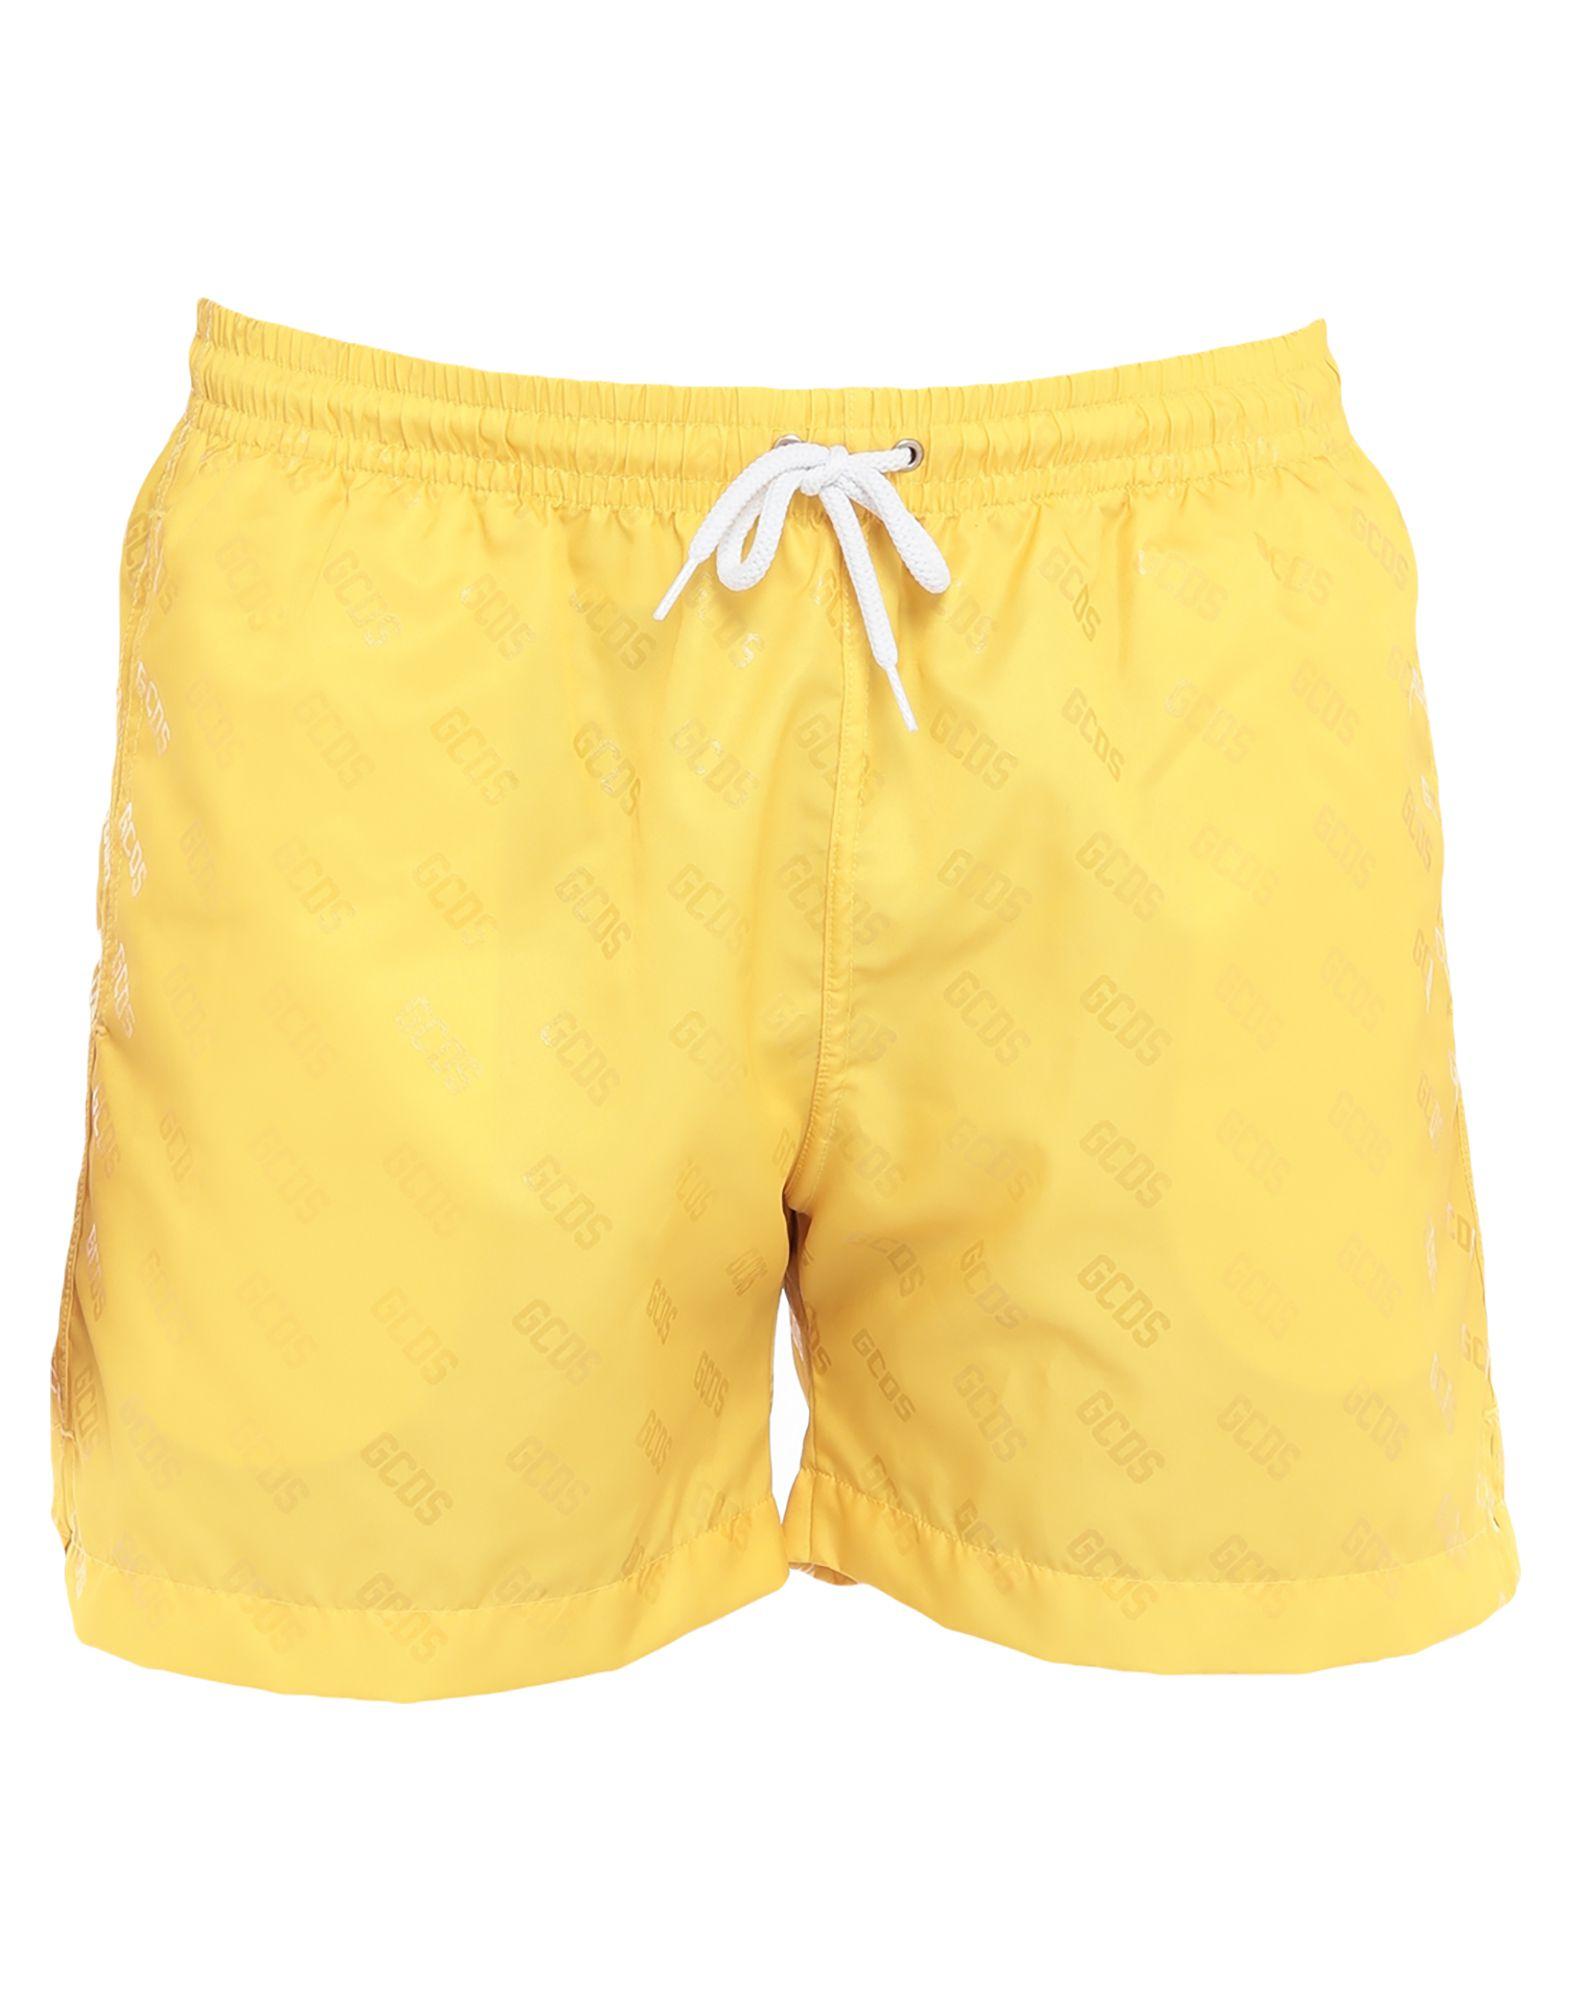 GCDS Swim trunks. techno fabric, logo, logo design, drawstring closure, front closure, multipockets, internal slip. 100% Polyester